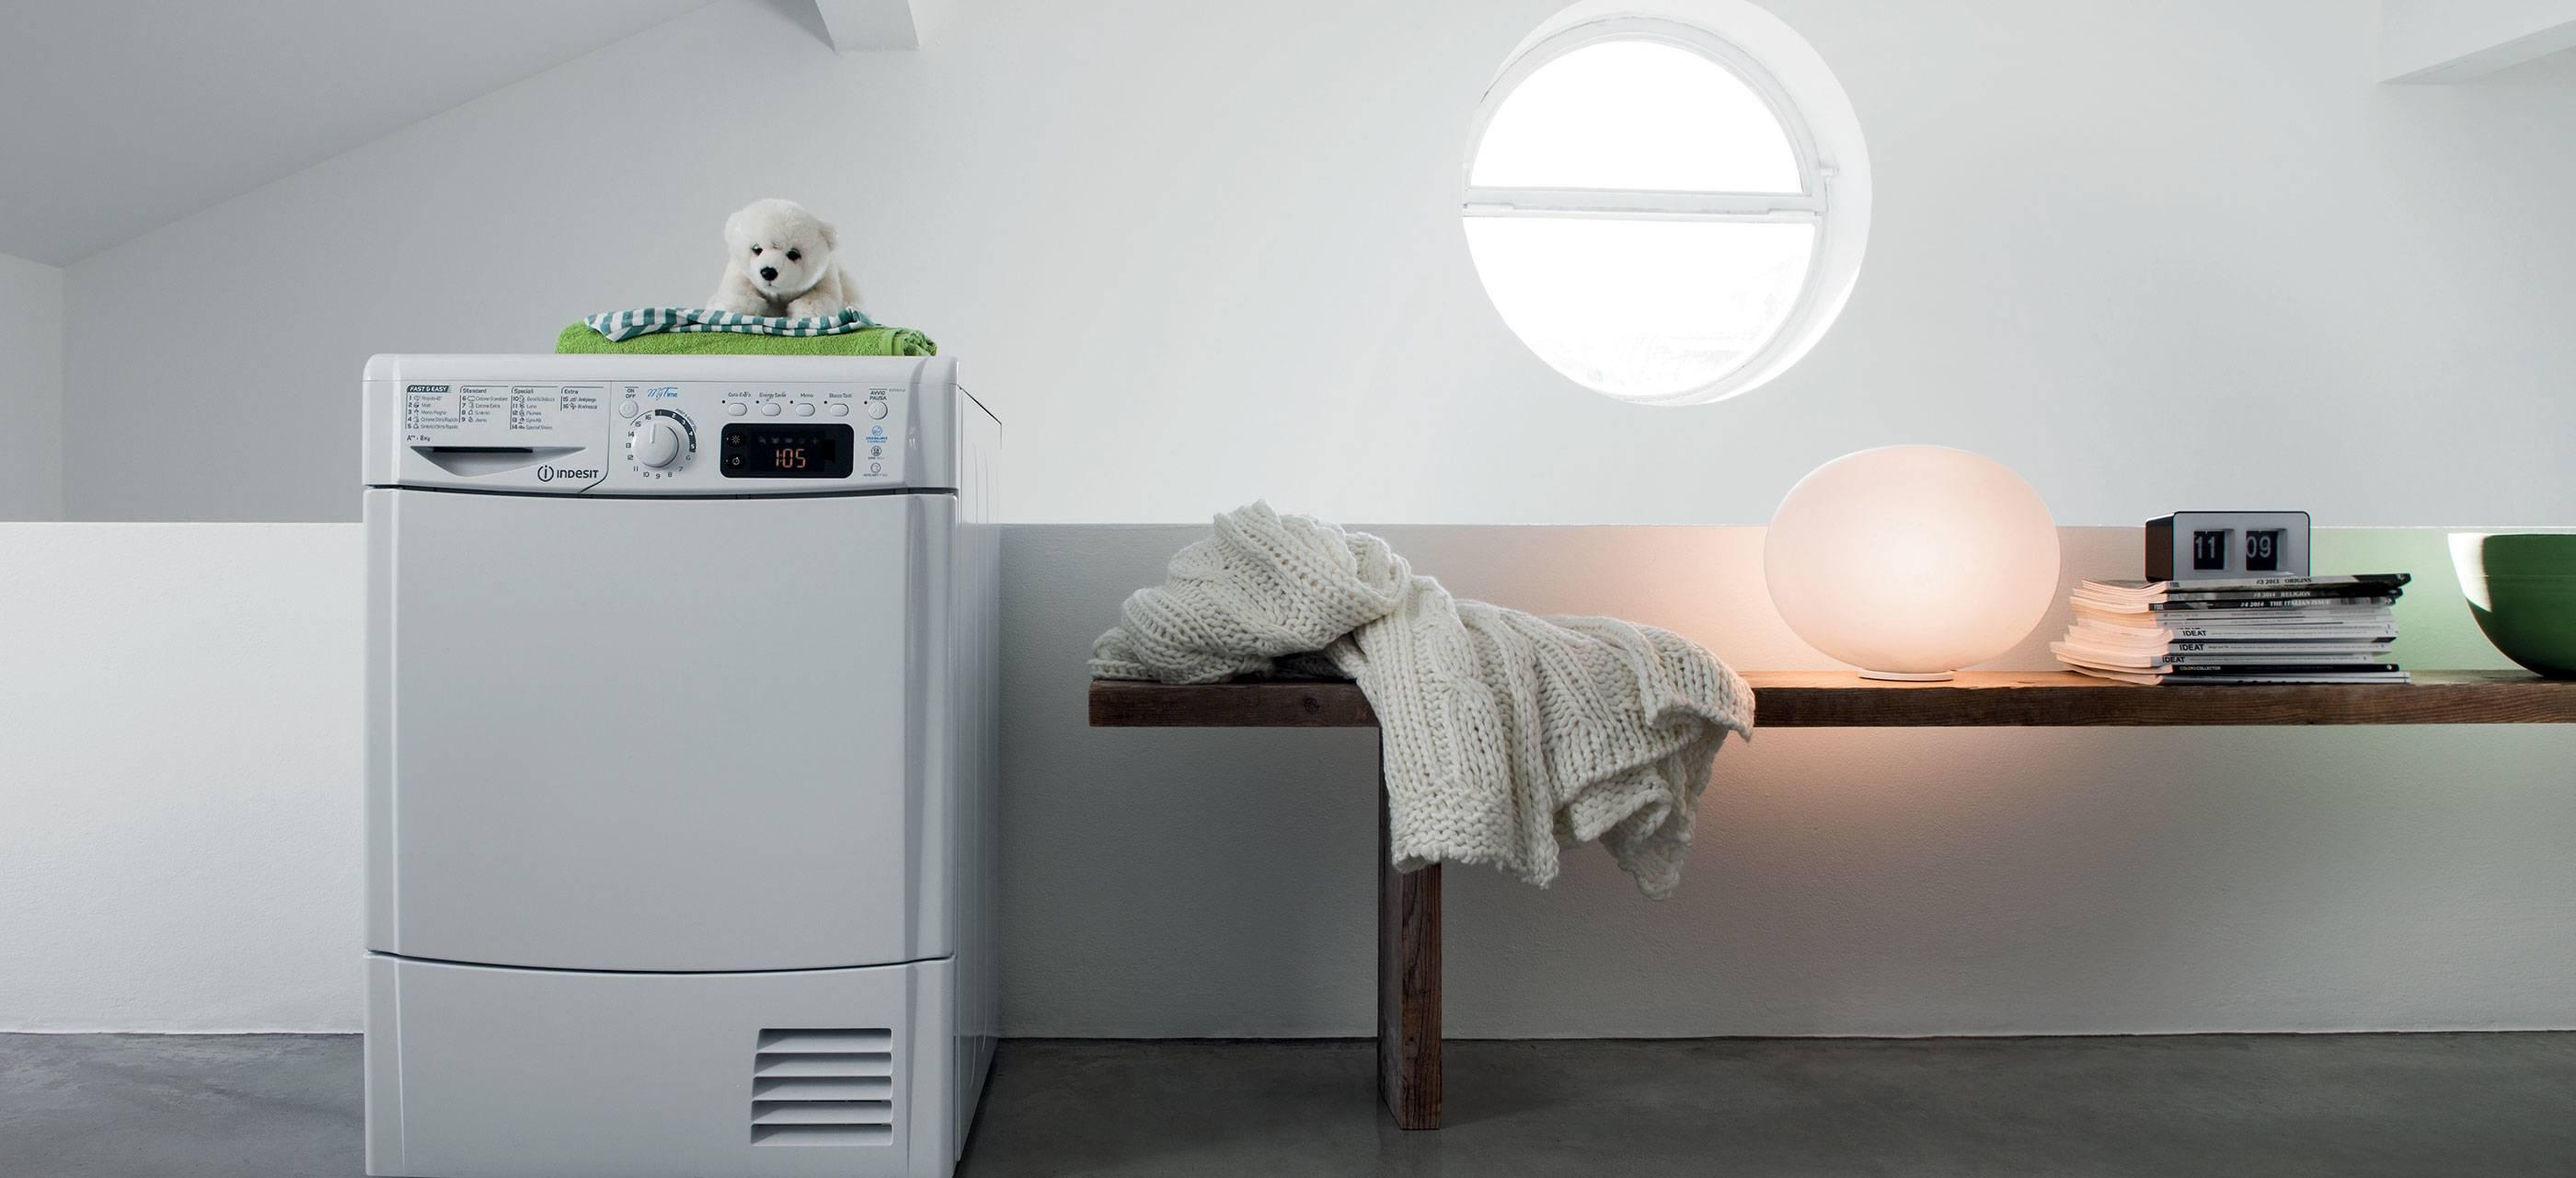 s 232 che linge 224 condensation indesit posable 7 kg idcl 75 b hr fr